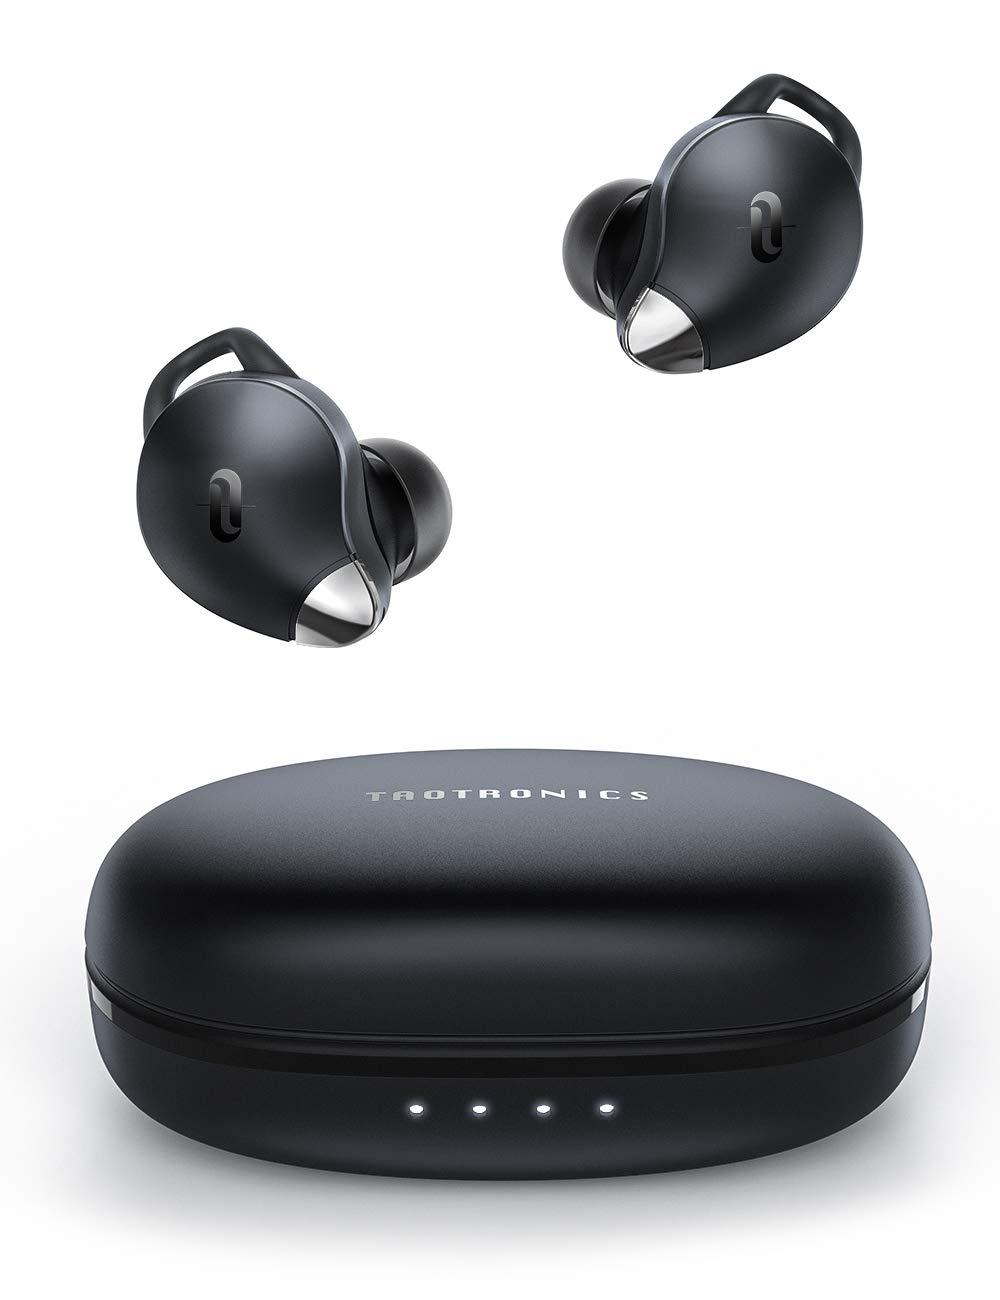 Wireless Earbuds TaoTronics Wireless Headphones Smart Touch Control 30Hrs IPX8 Waterproof Bluetooth 5.0 Hi-Fi Stereo Audio Wireless Eardphones in ear SoundLiberty 92 for Smartphone Tablet Laptop